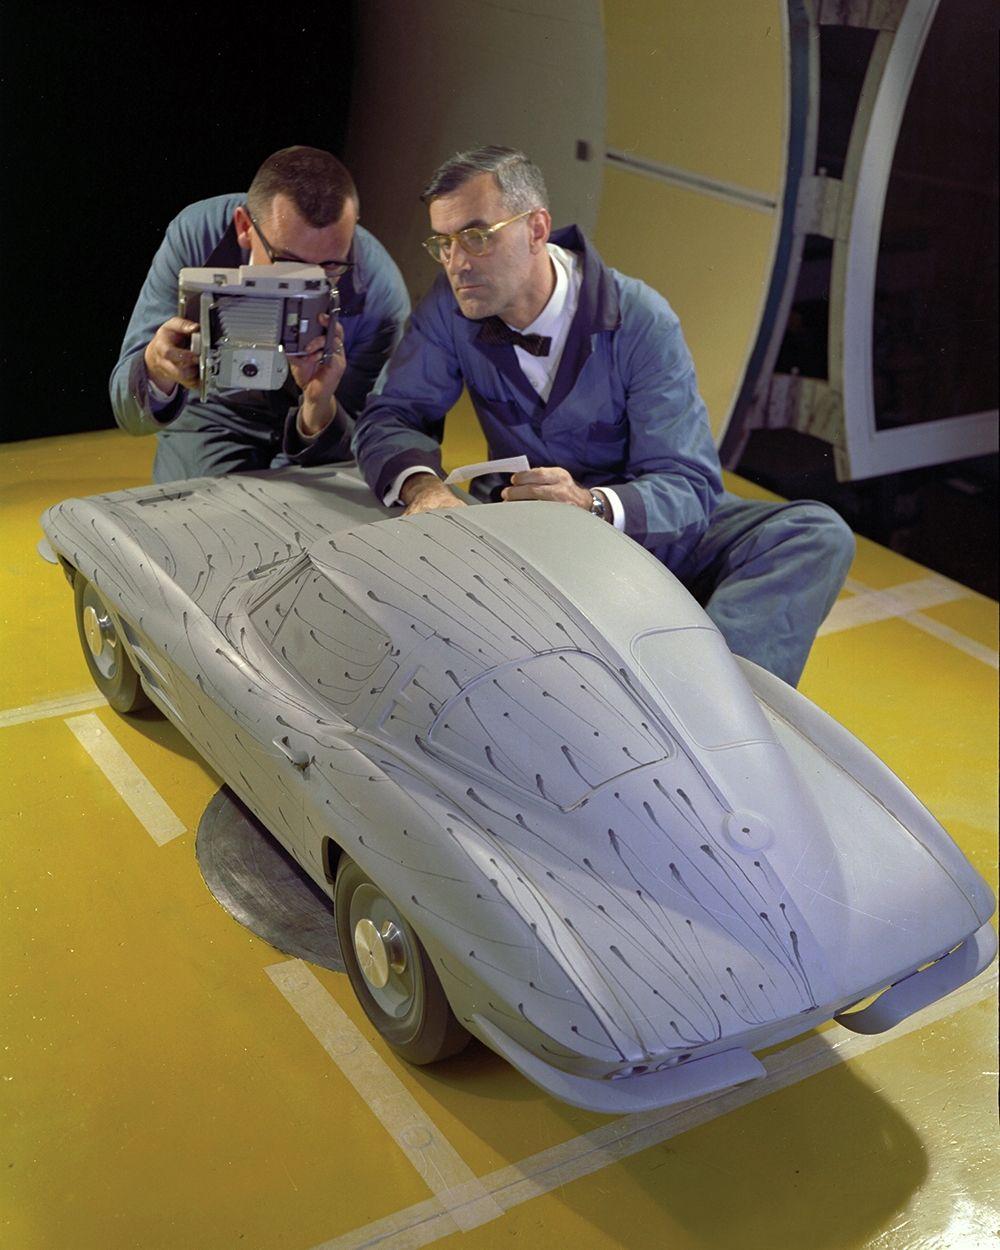 1963 Chevrolet Corvette C2 Sting Ray - Project XP-87